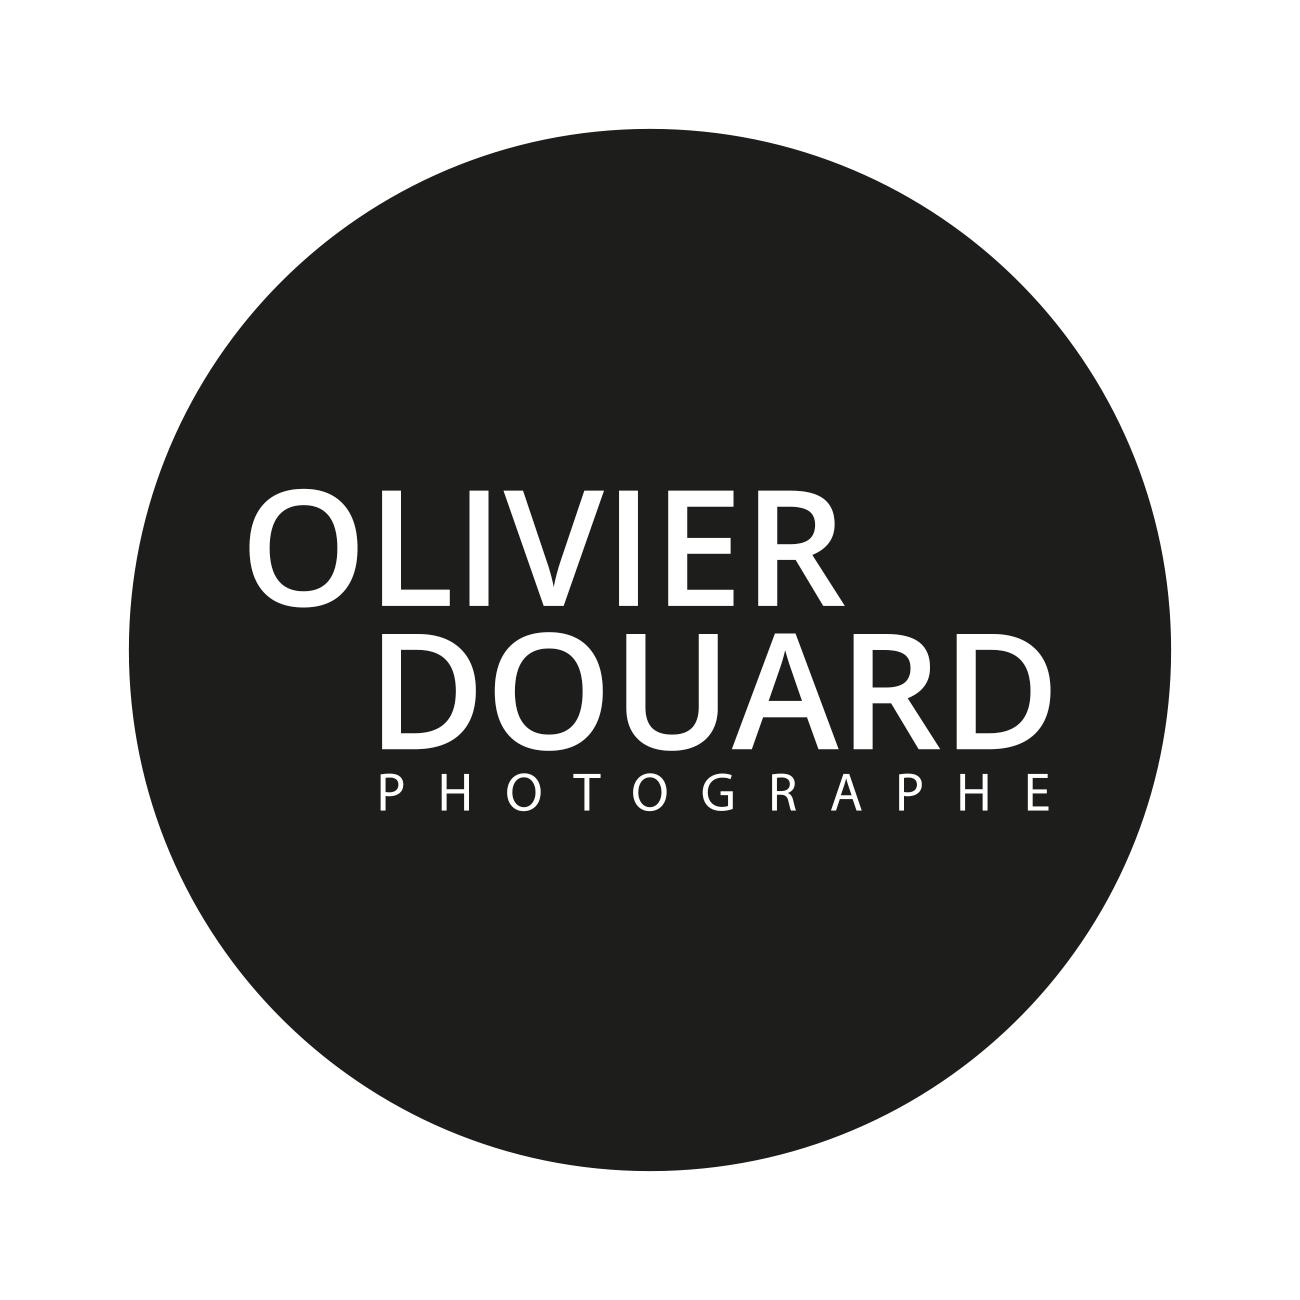 Photographe Troyes Aube professionnel